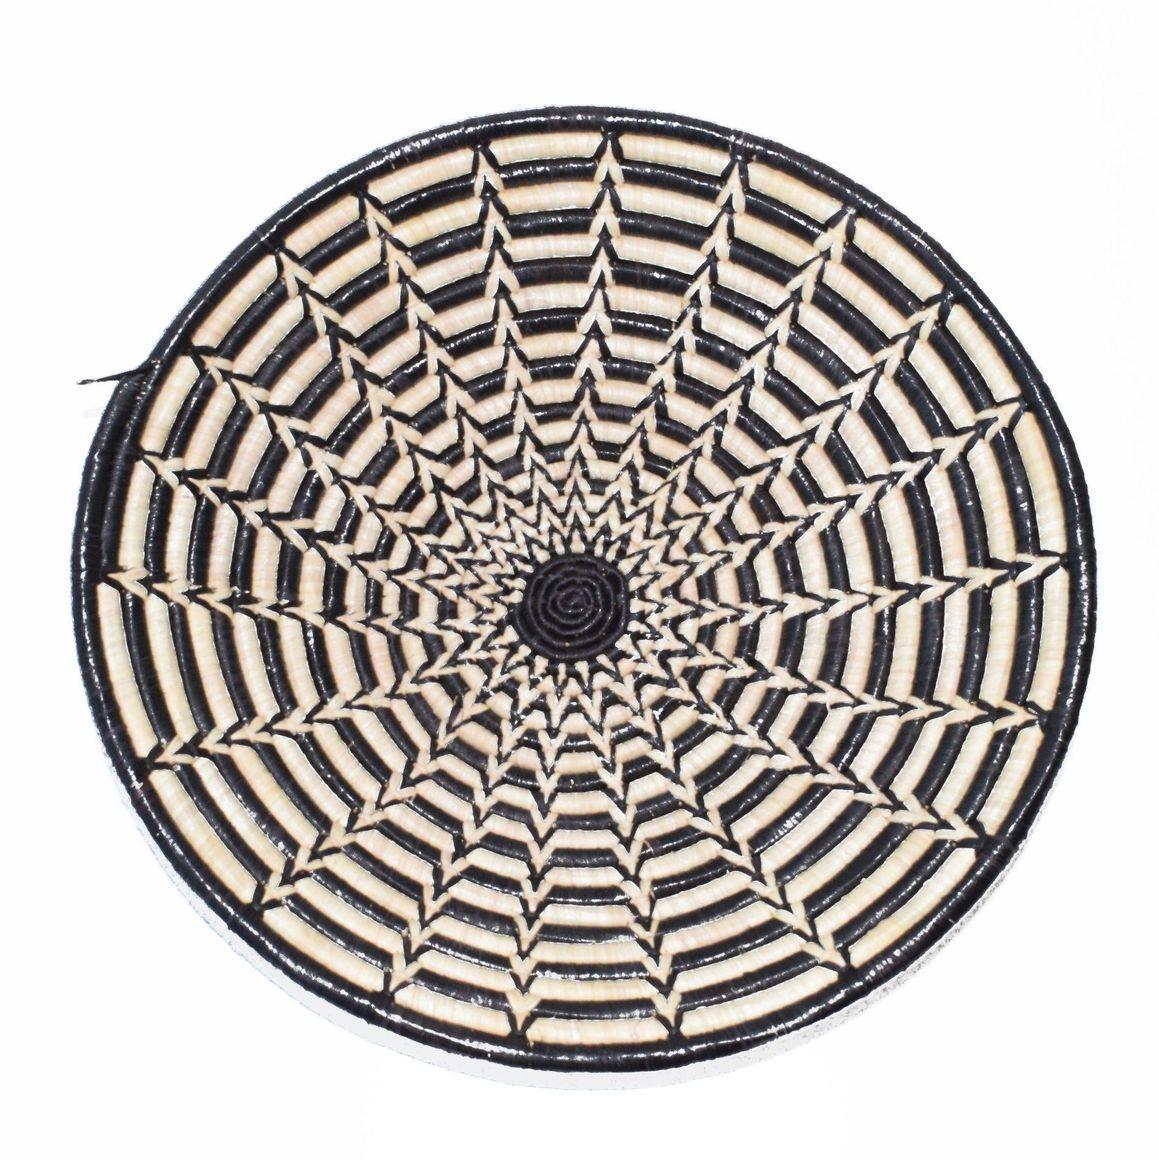 Small 20cm diameter woven bowl - Star | Trada Marketplace